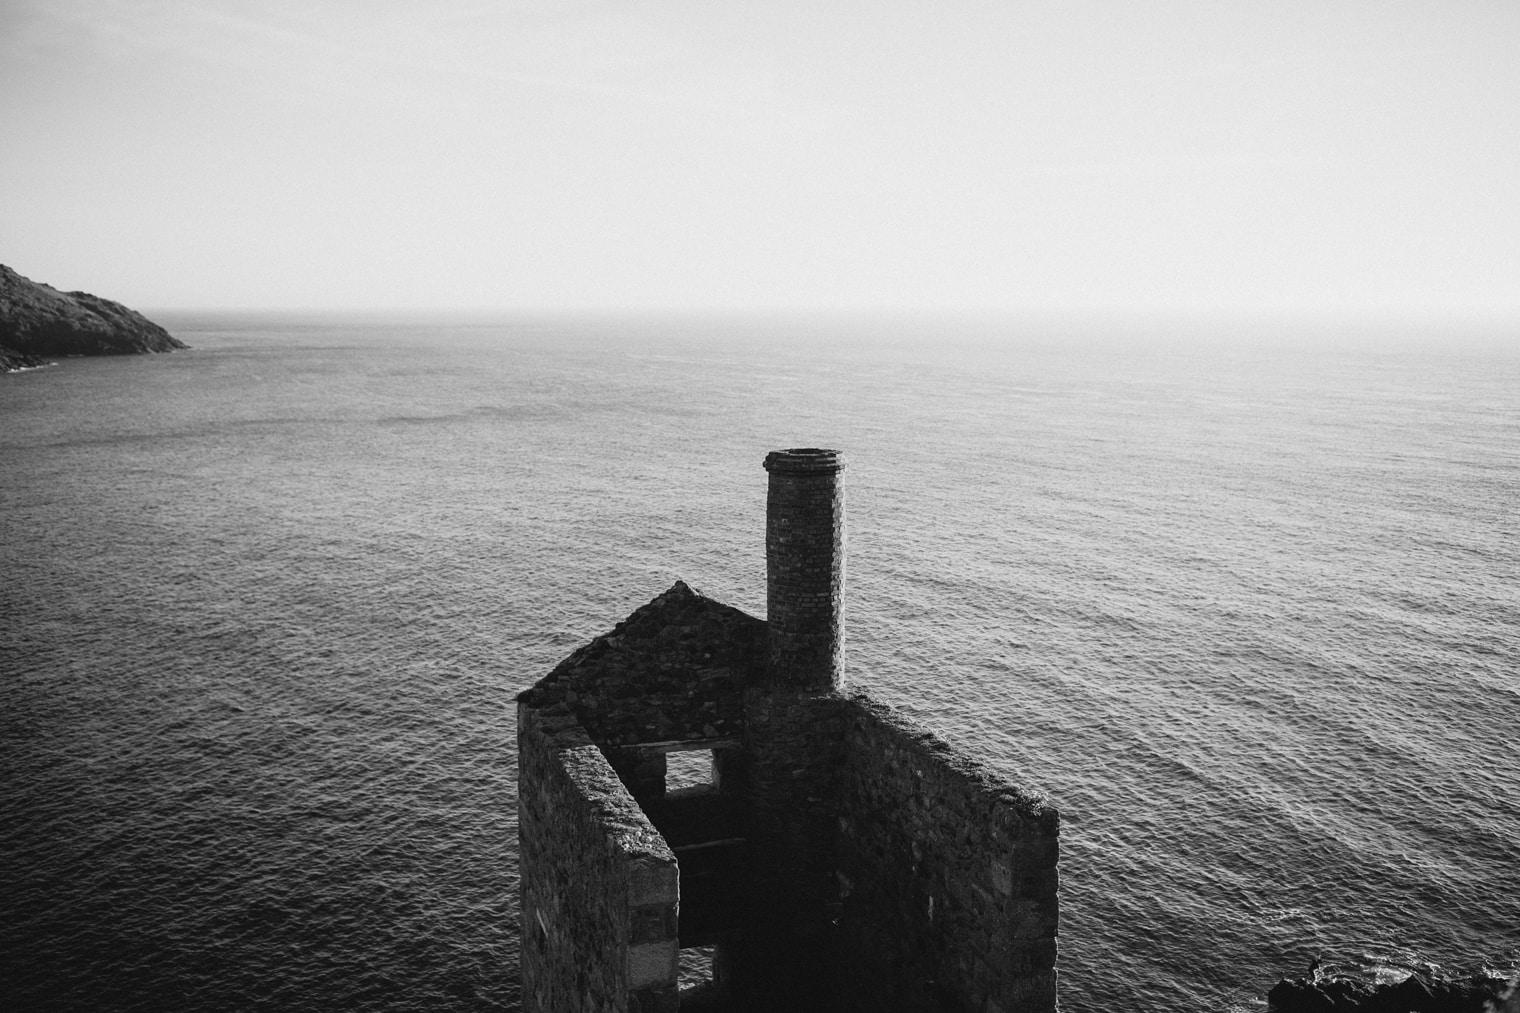 Cornish tin mine overlooking sea in England